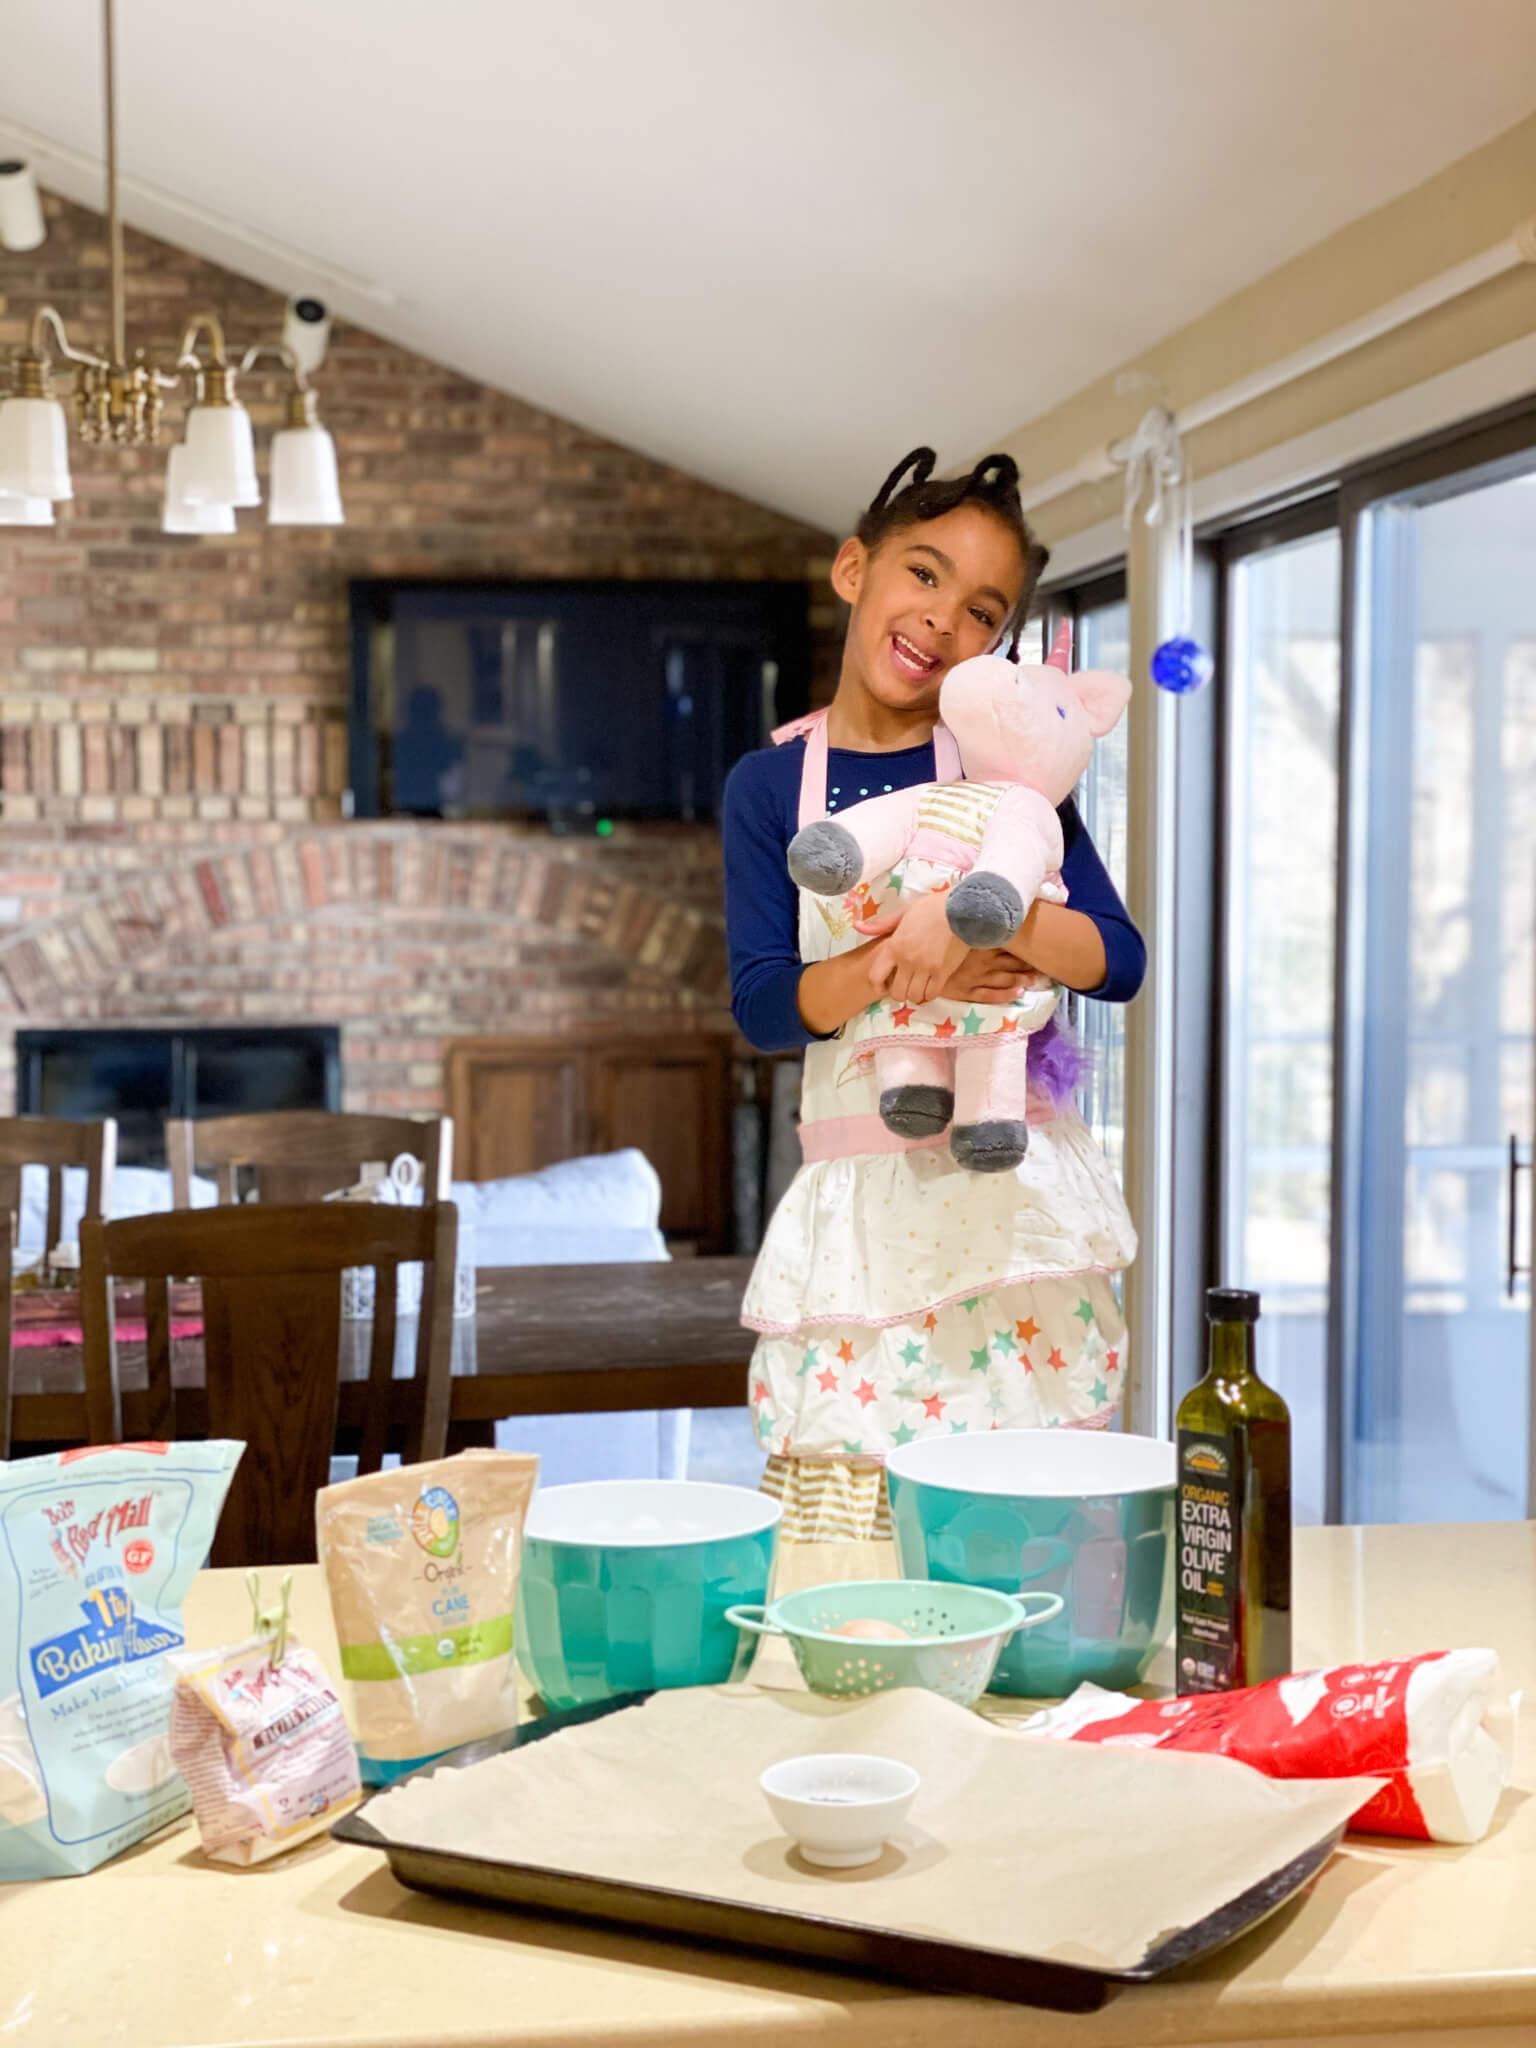 Gluten and Dairy-Free Almond Poppy Seed Sheet Cake Recipe agutsygirl.com #glutenfreerecipe #dairyfreerecipe #glutenfreedairyfree #poppyseed Samarah and Unicorn kids baking